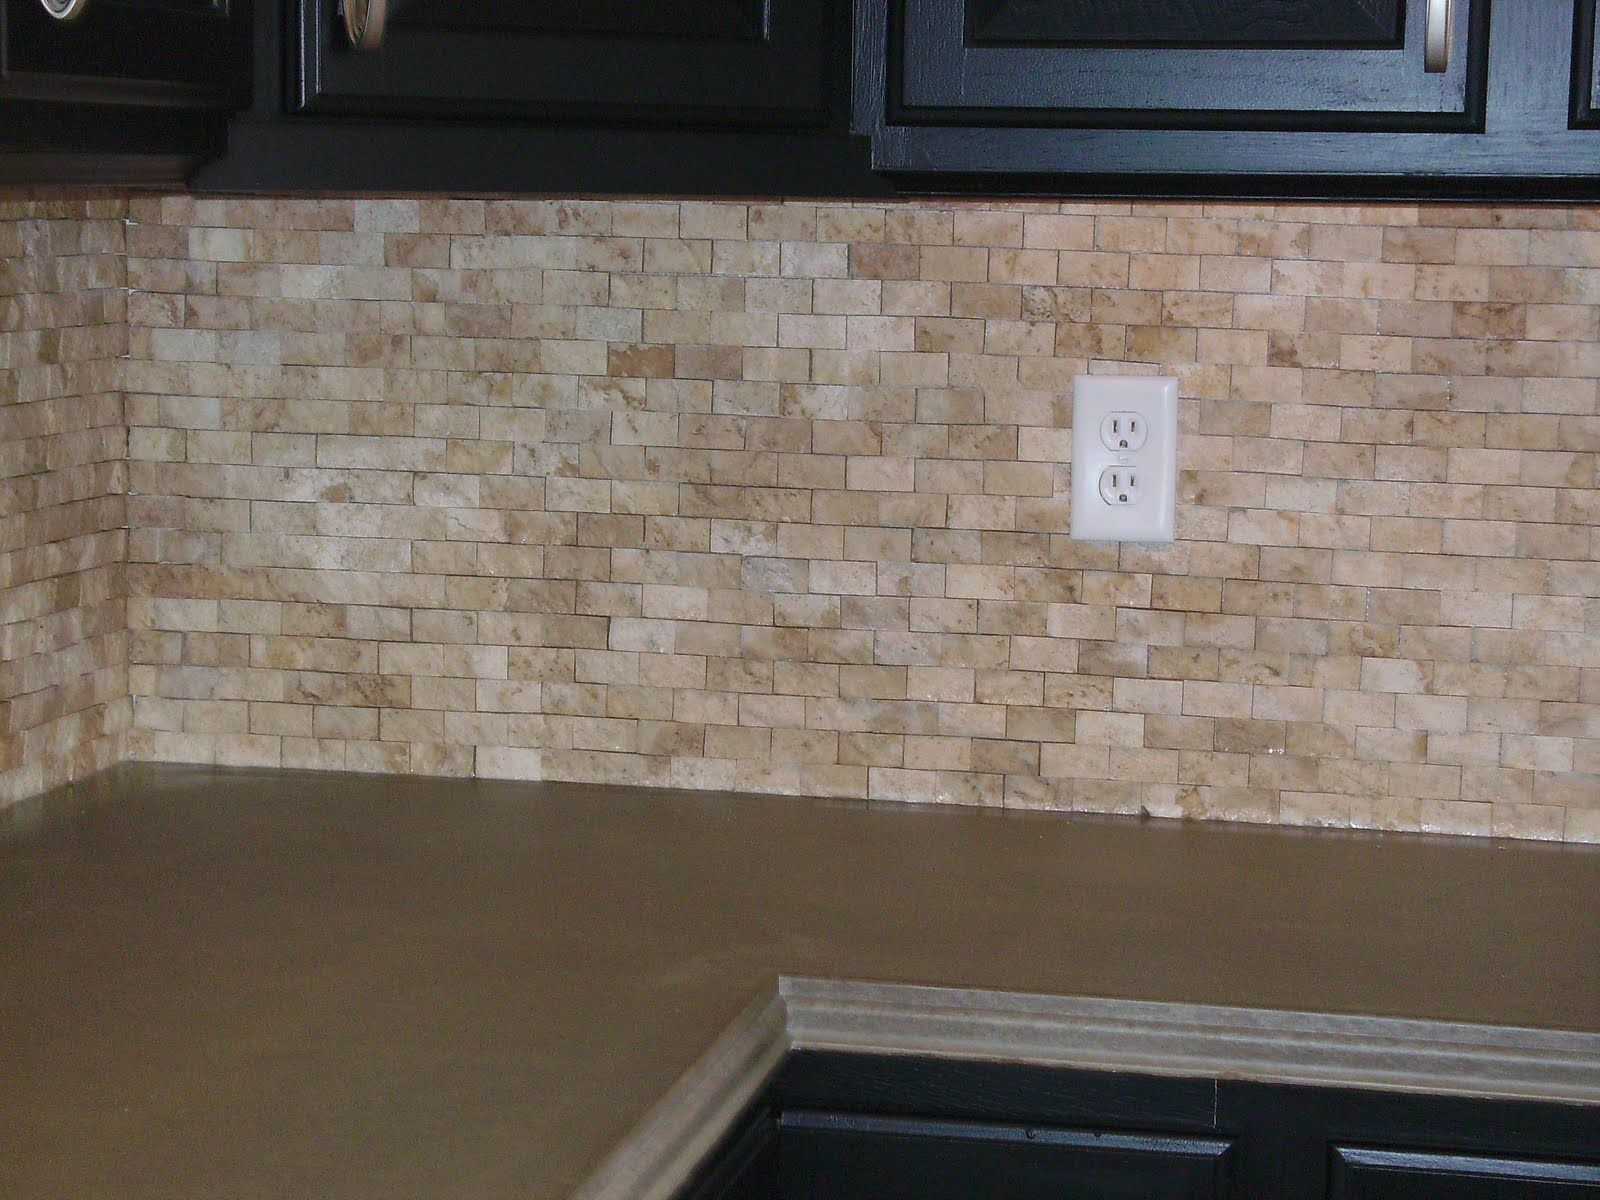 natural stone backsplash kitchen aid gas stove travertine split face knapp tile and flooring